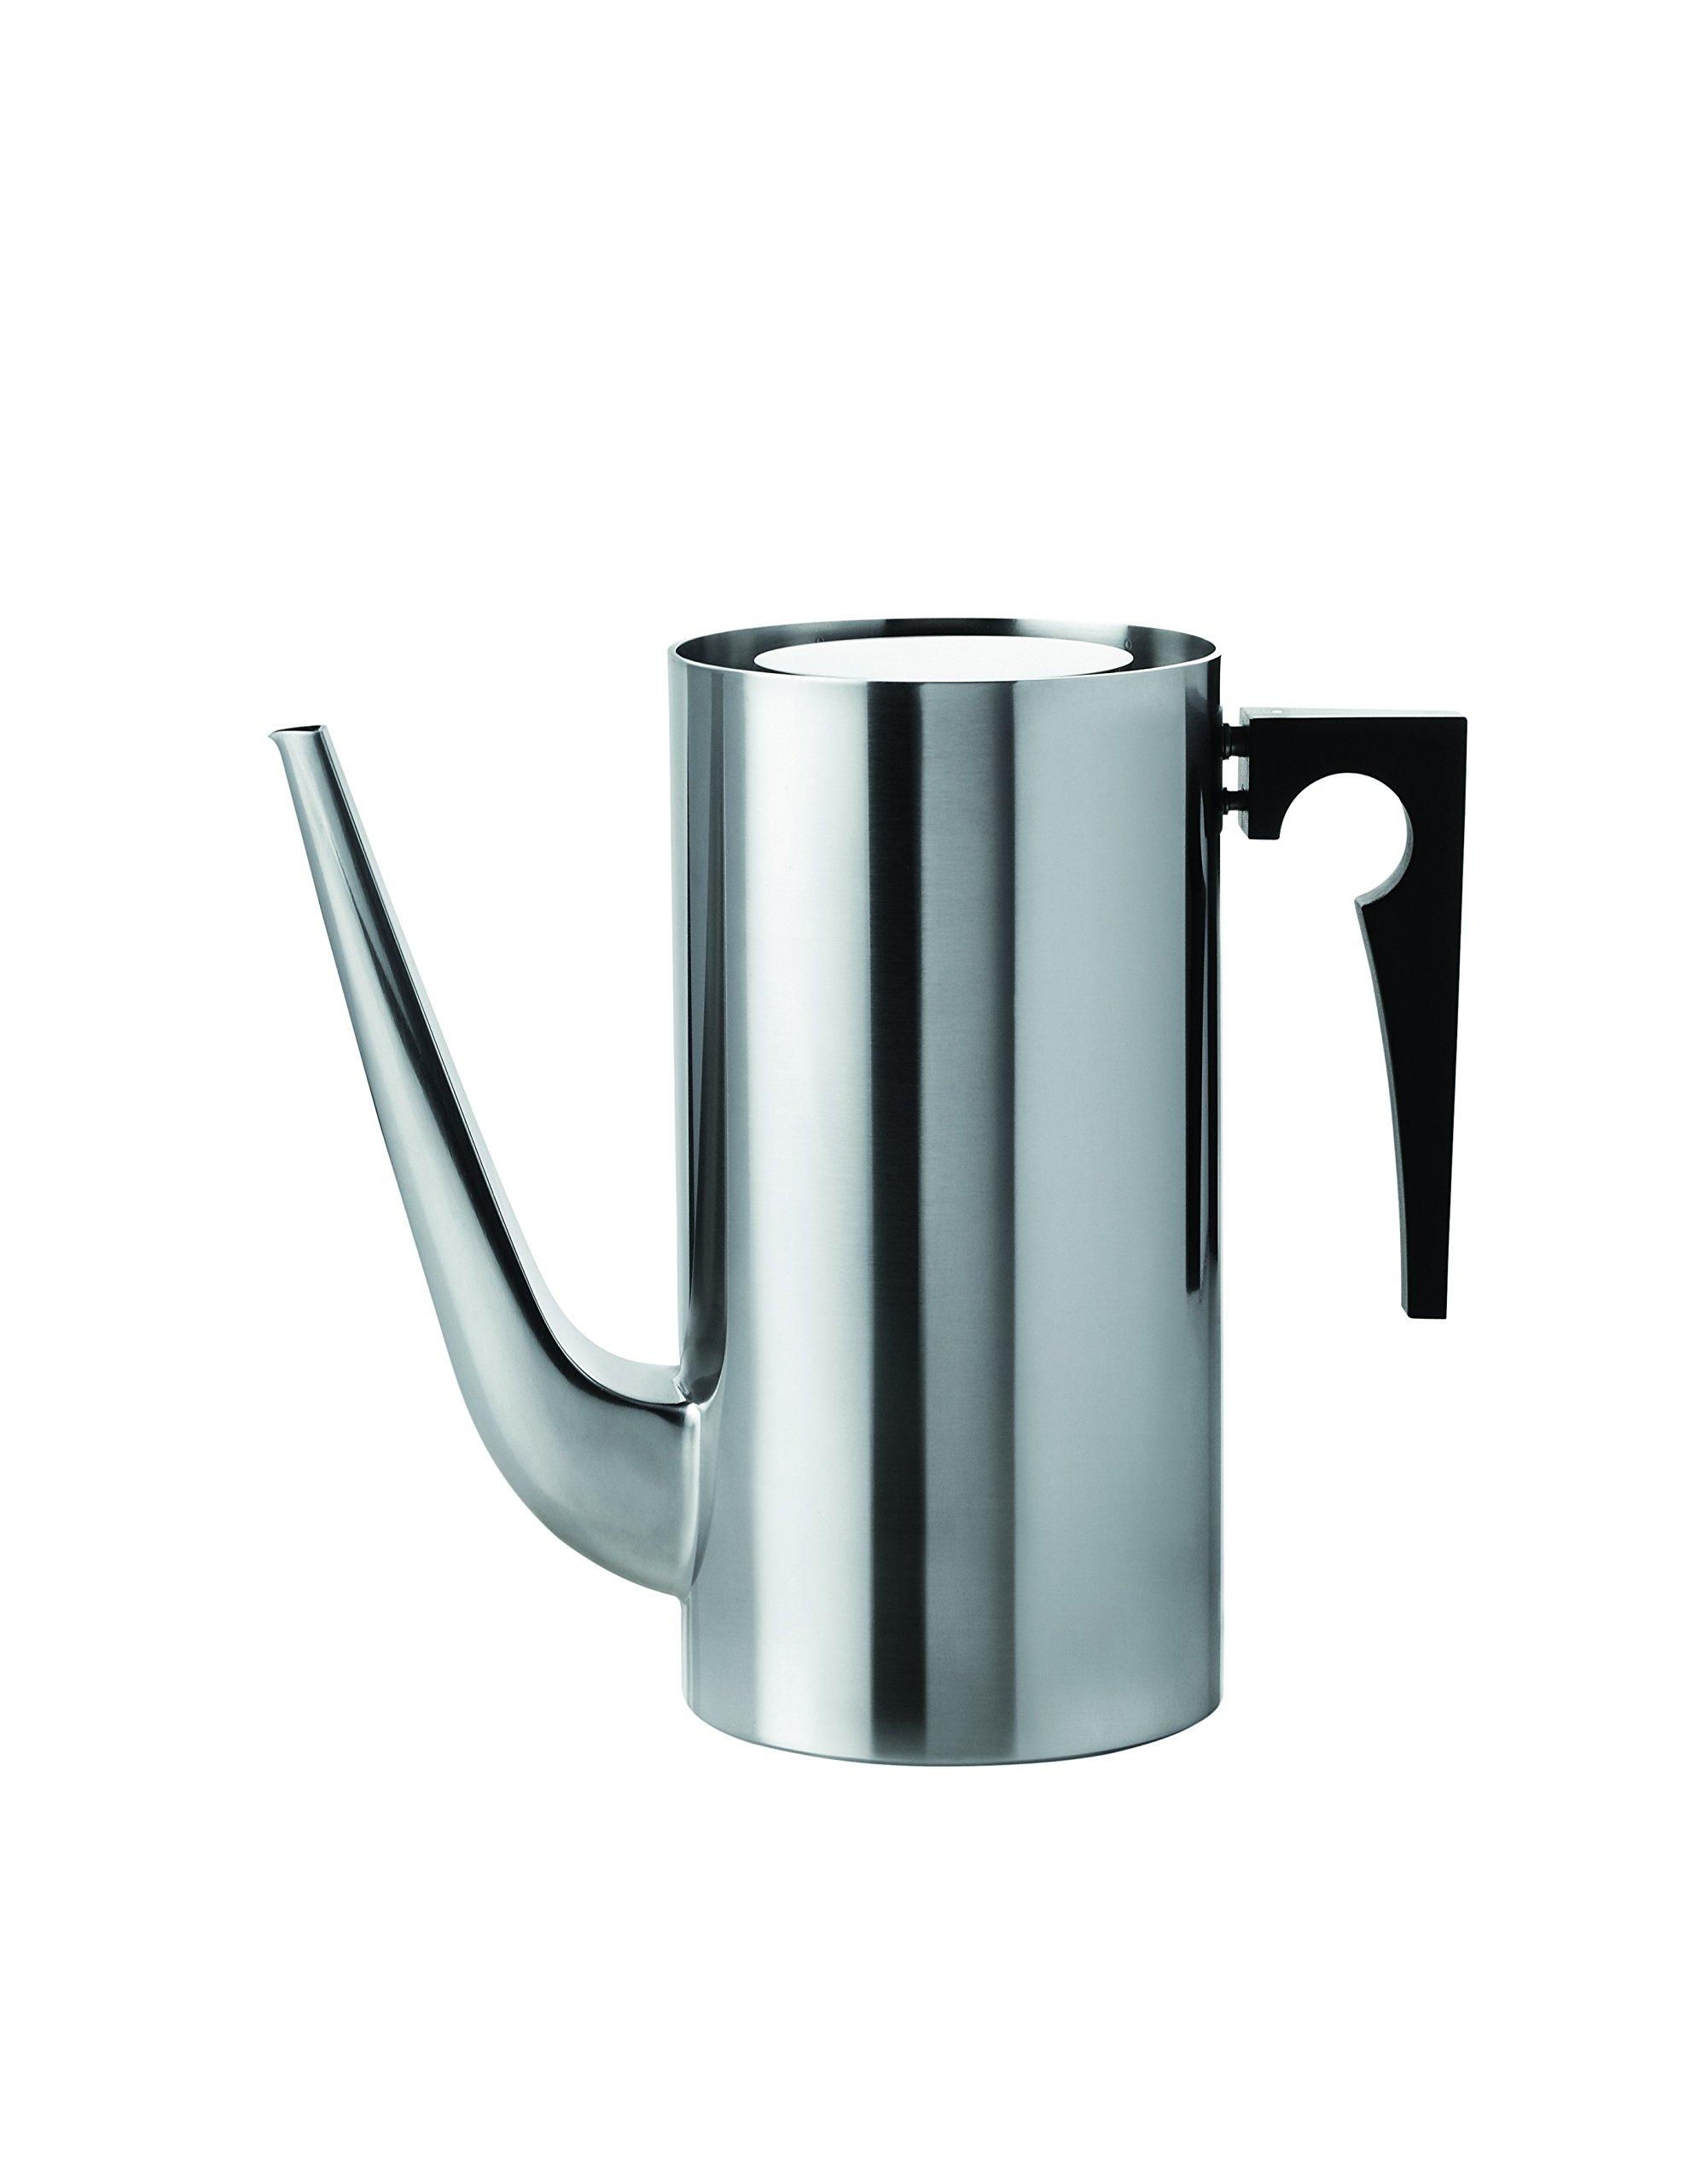 Stelton Arne Jacobsen coffee pot, 50.7 oz